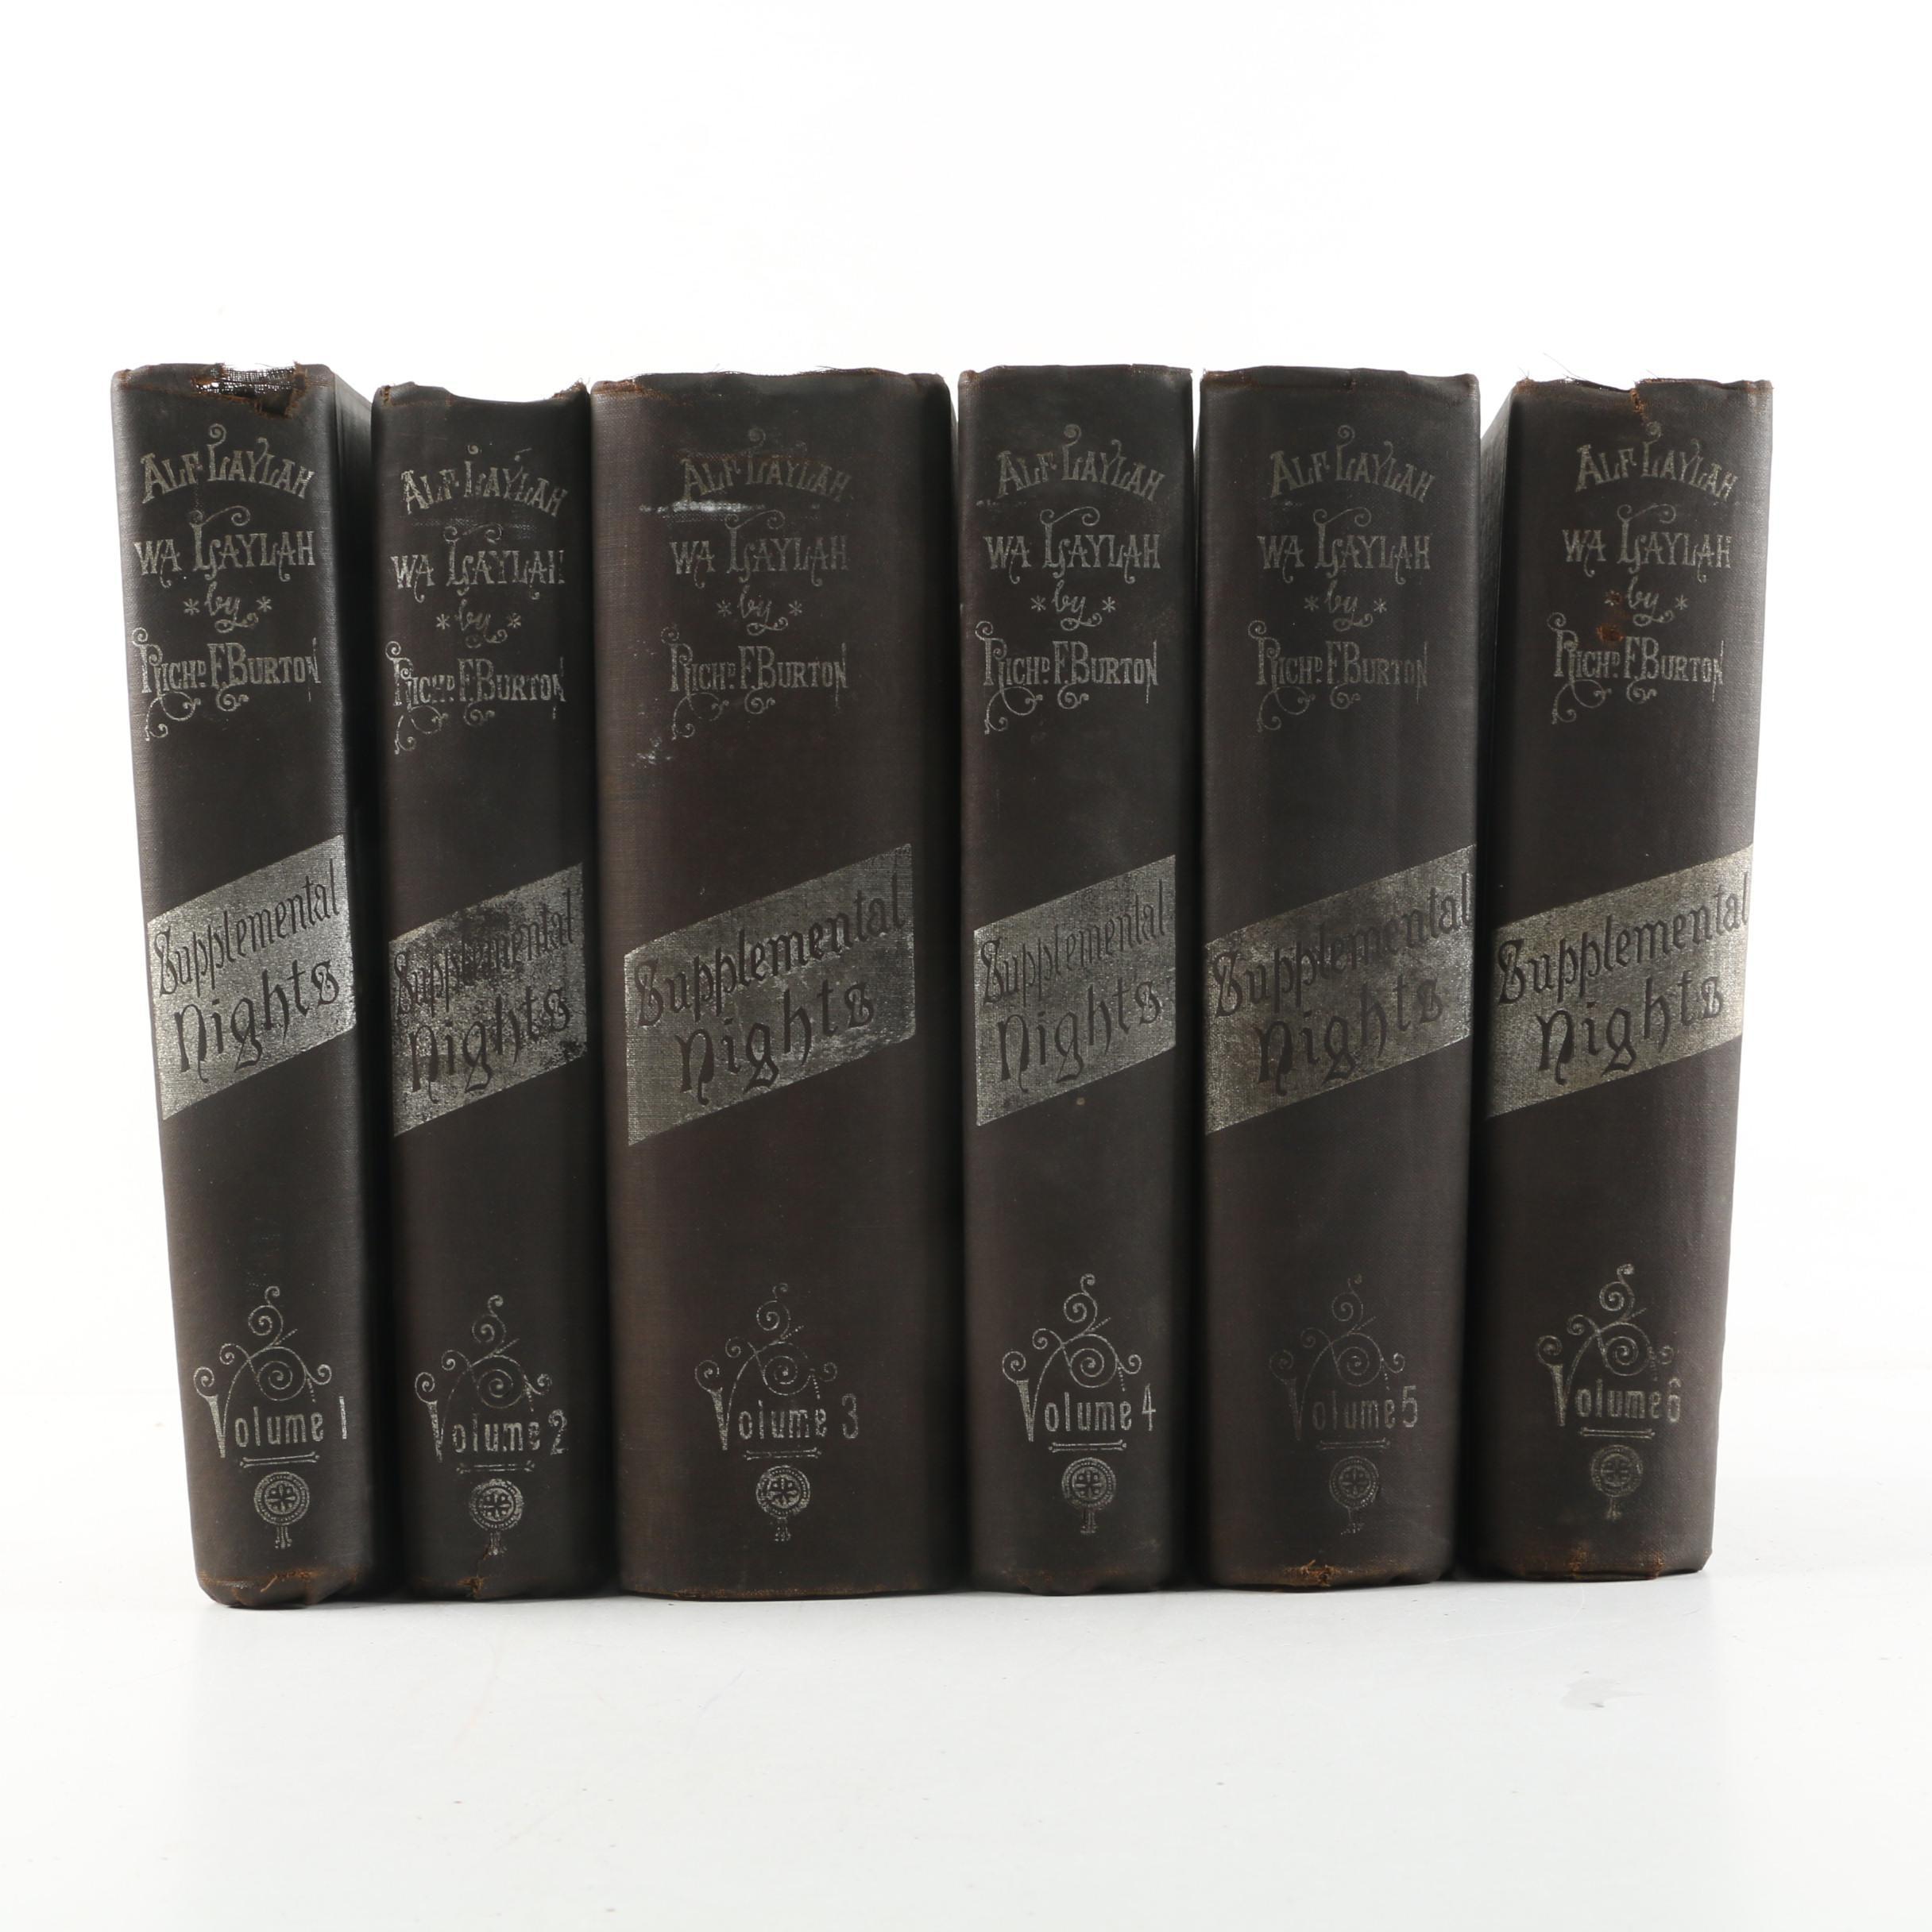 "1886-8 Limited ""Supplemental Nights"" Six Volume Set by Richard Burton"